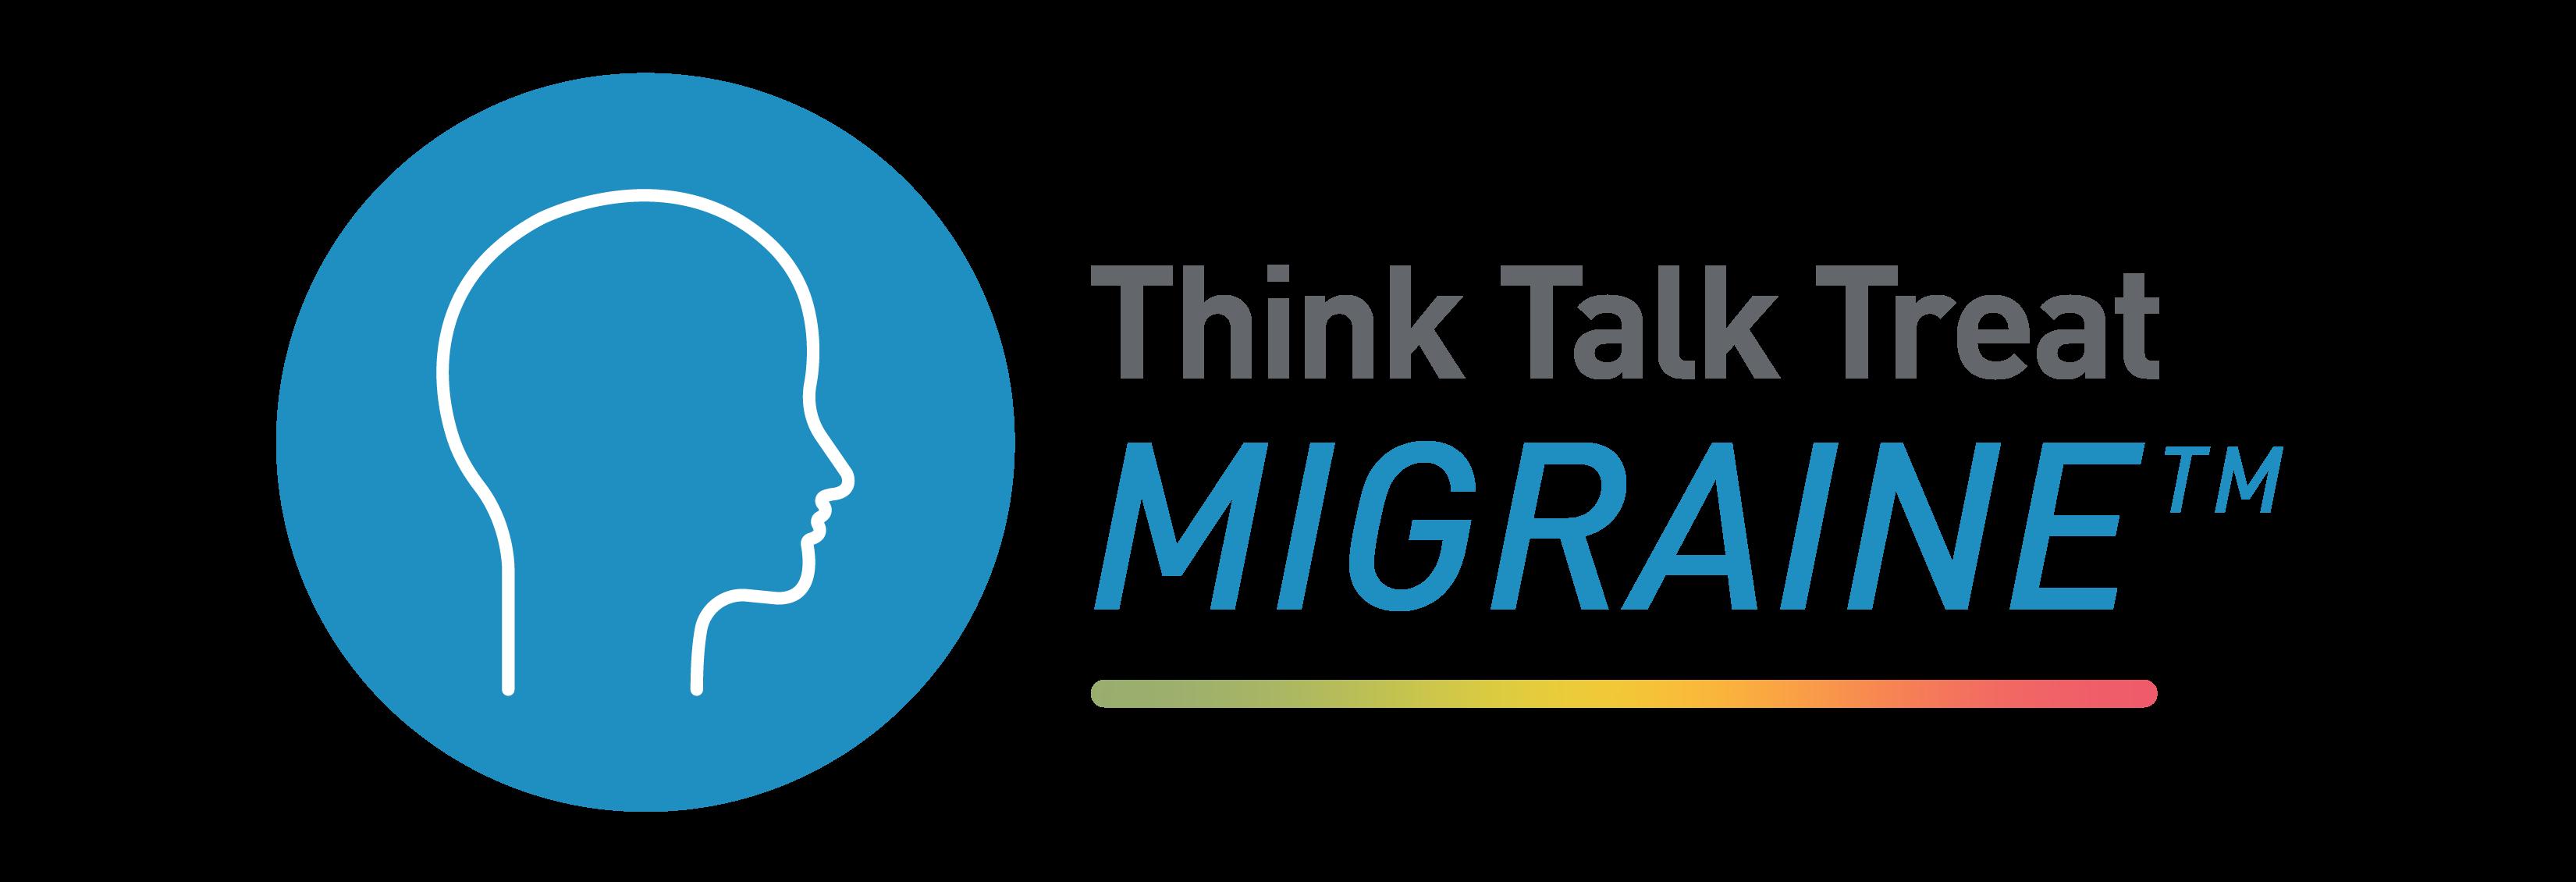 Think Talk Treat Migraine